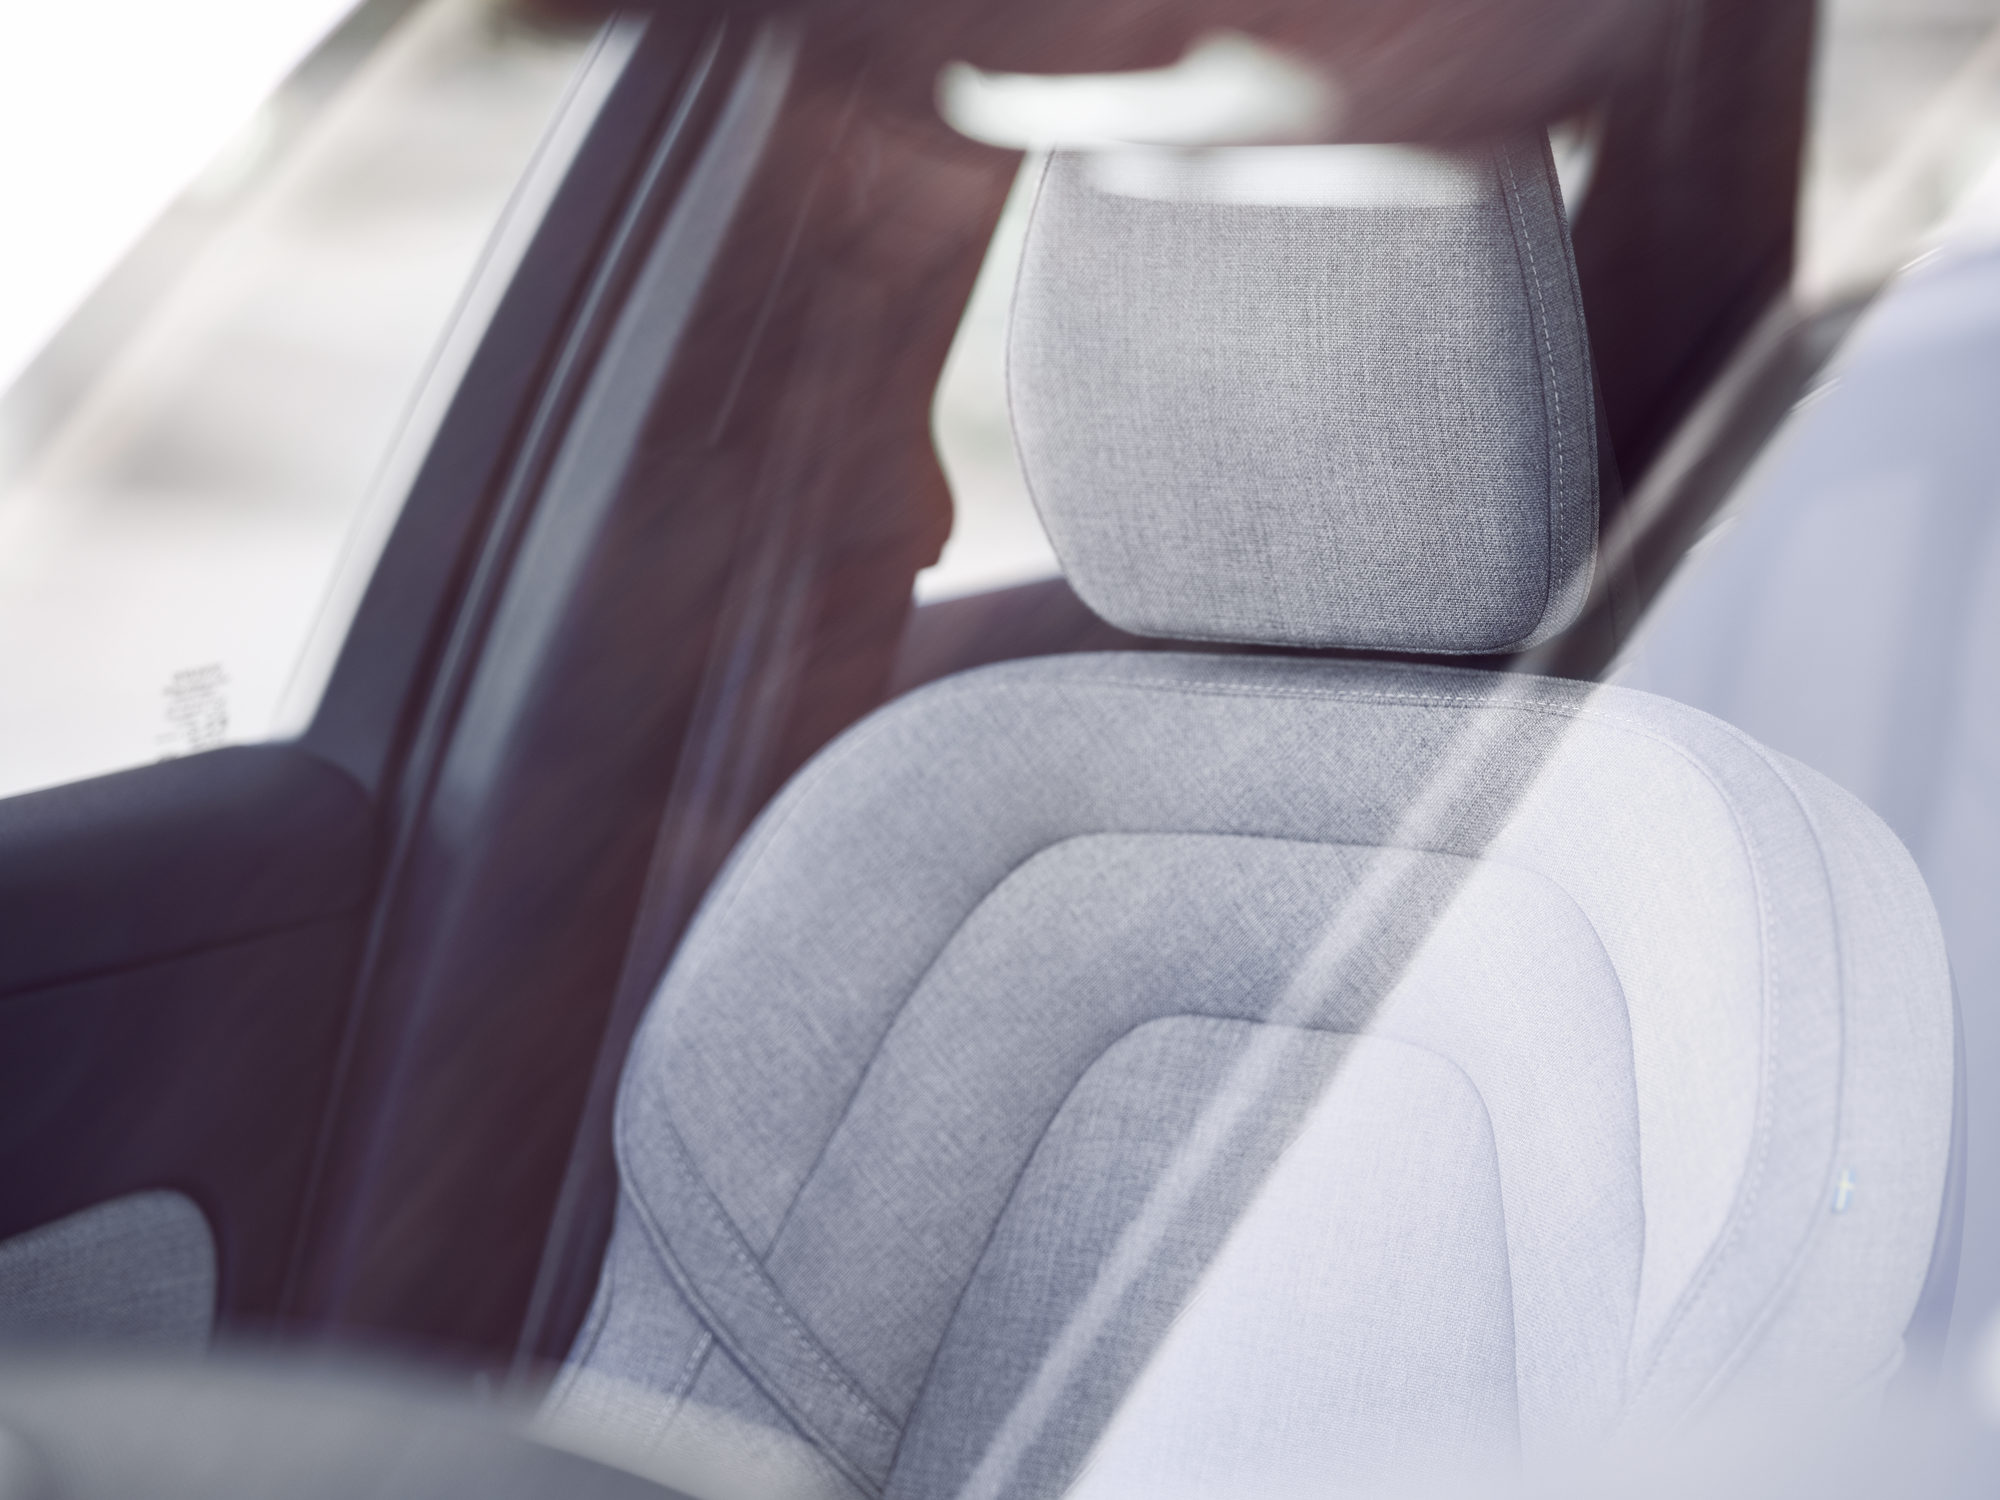 Volvo XC60 passagiersstoel